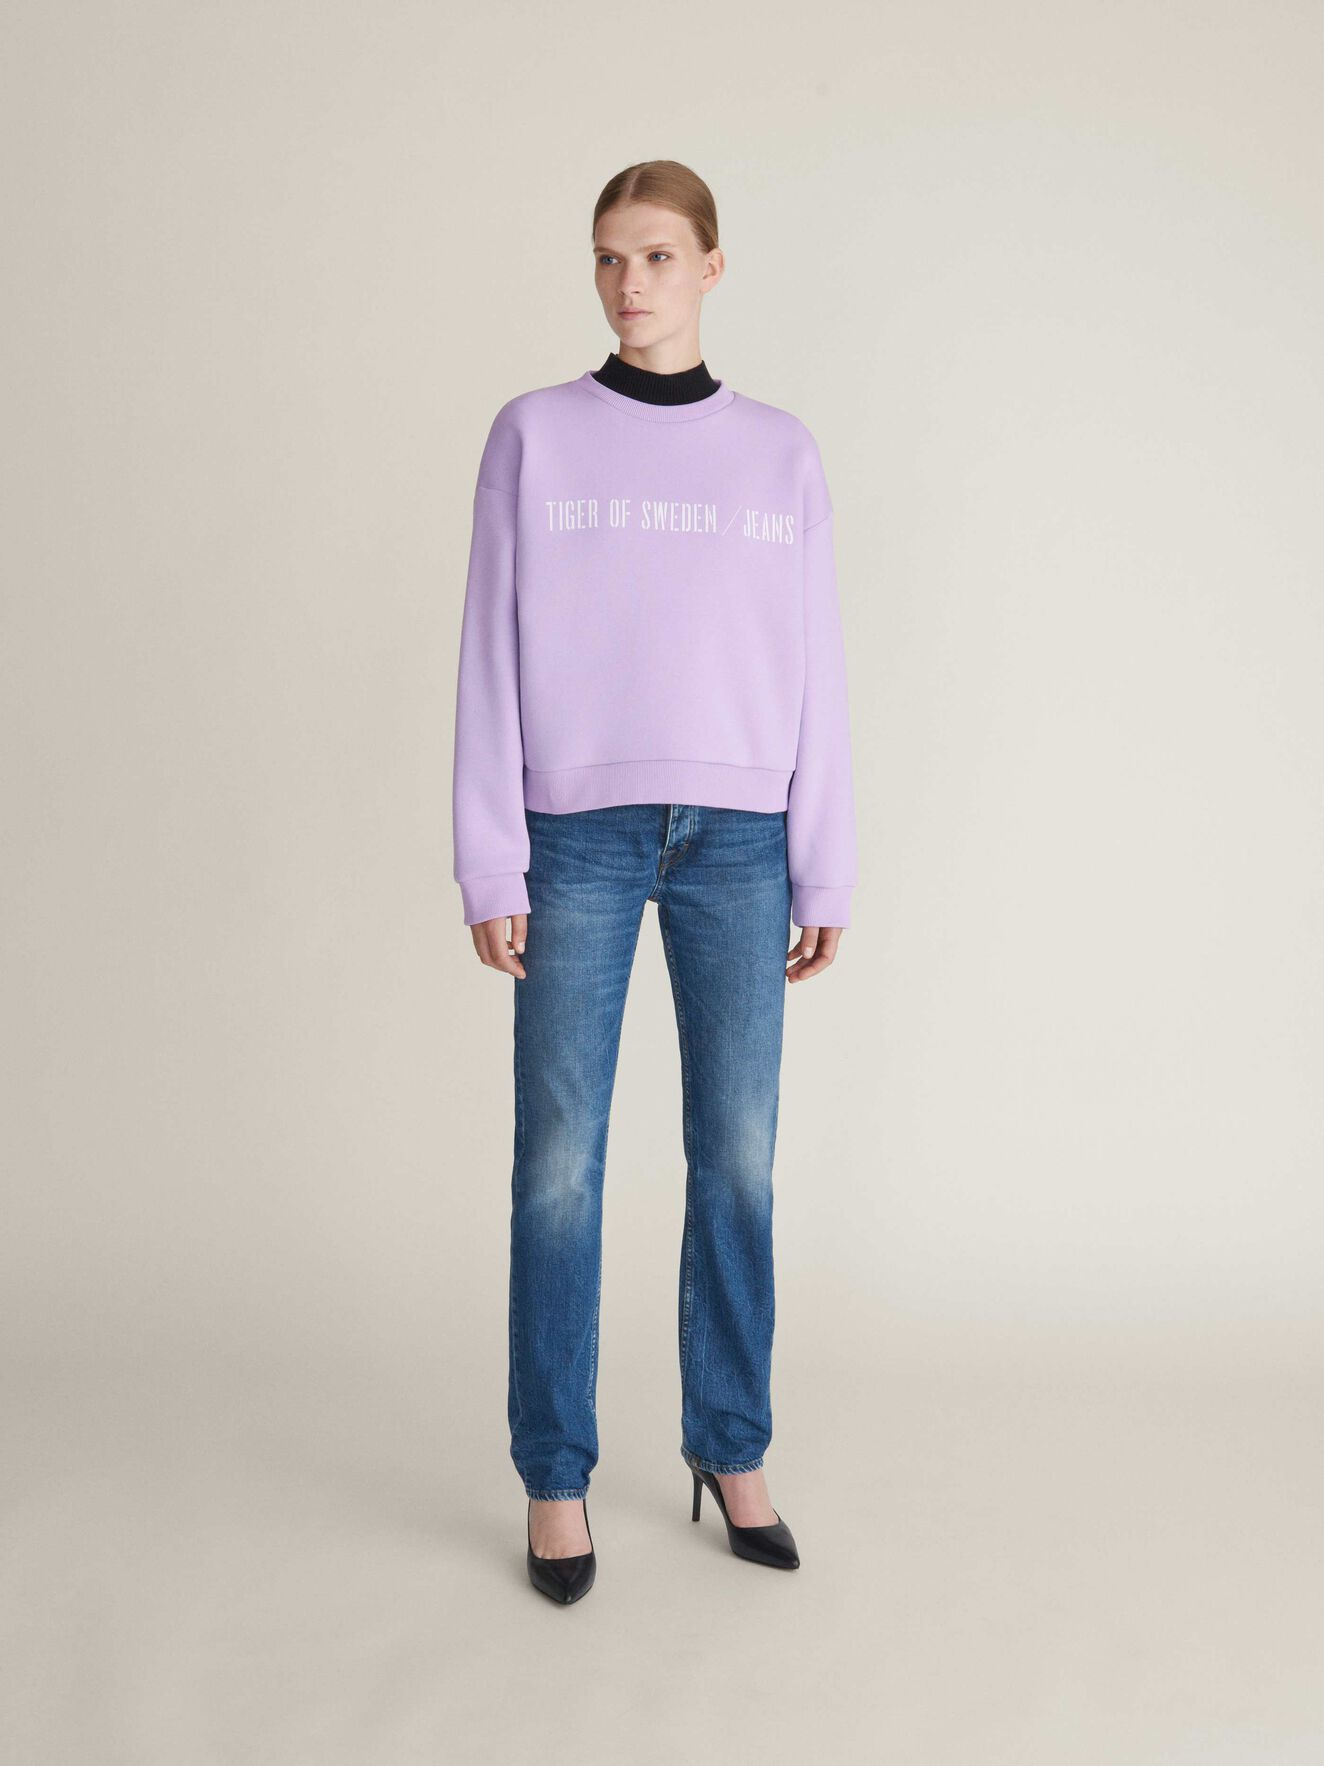 Big Marz Sweatshirt in Lilac Breeze from Tiger of Sweden